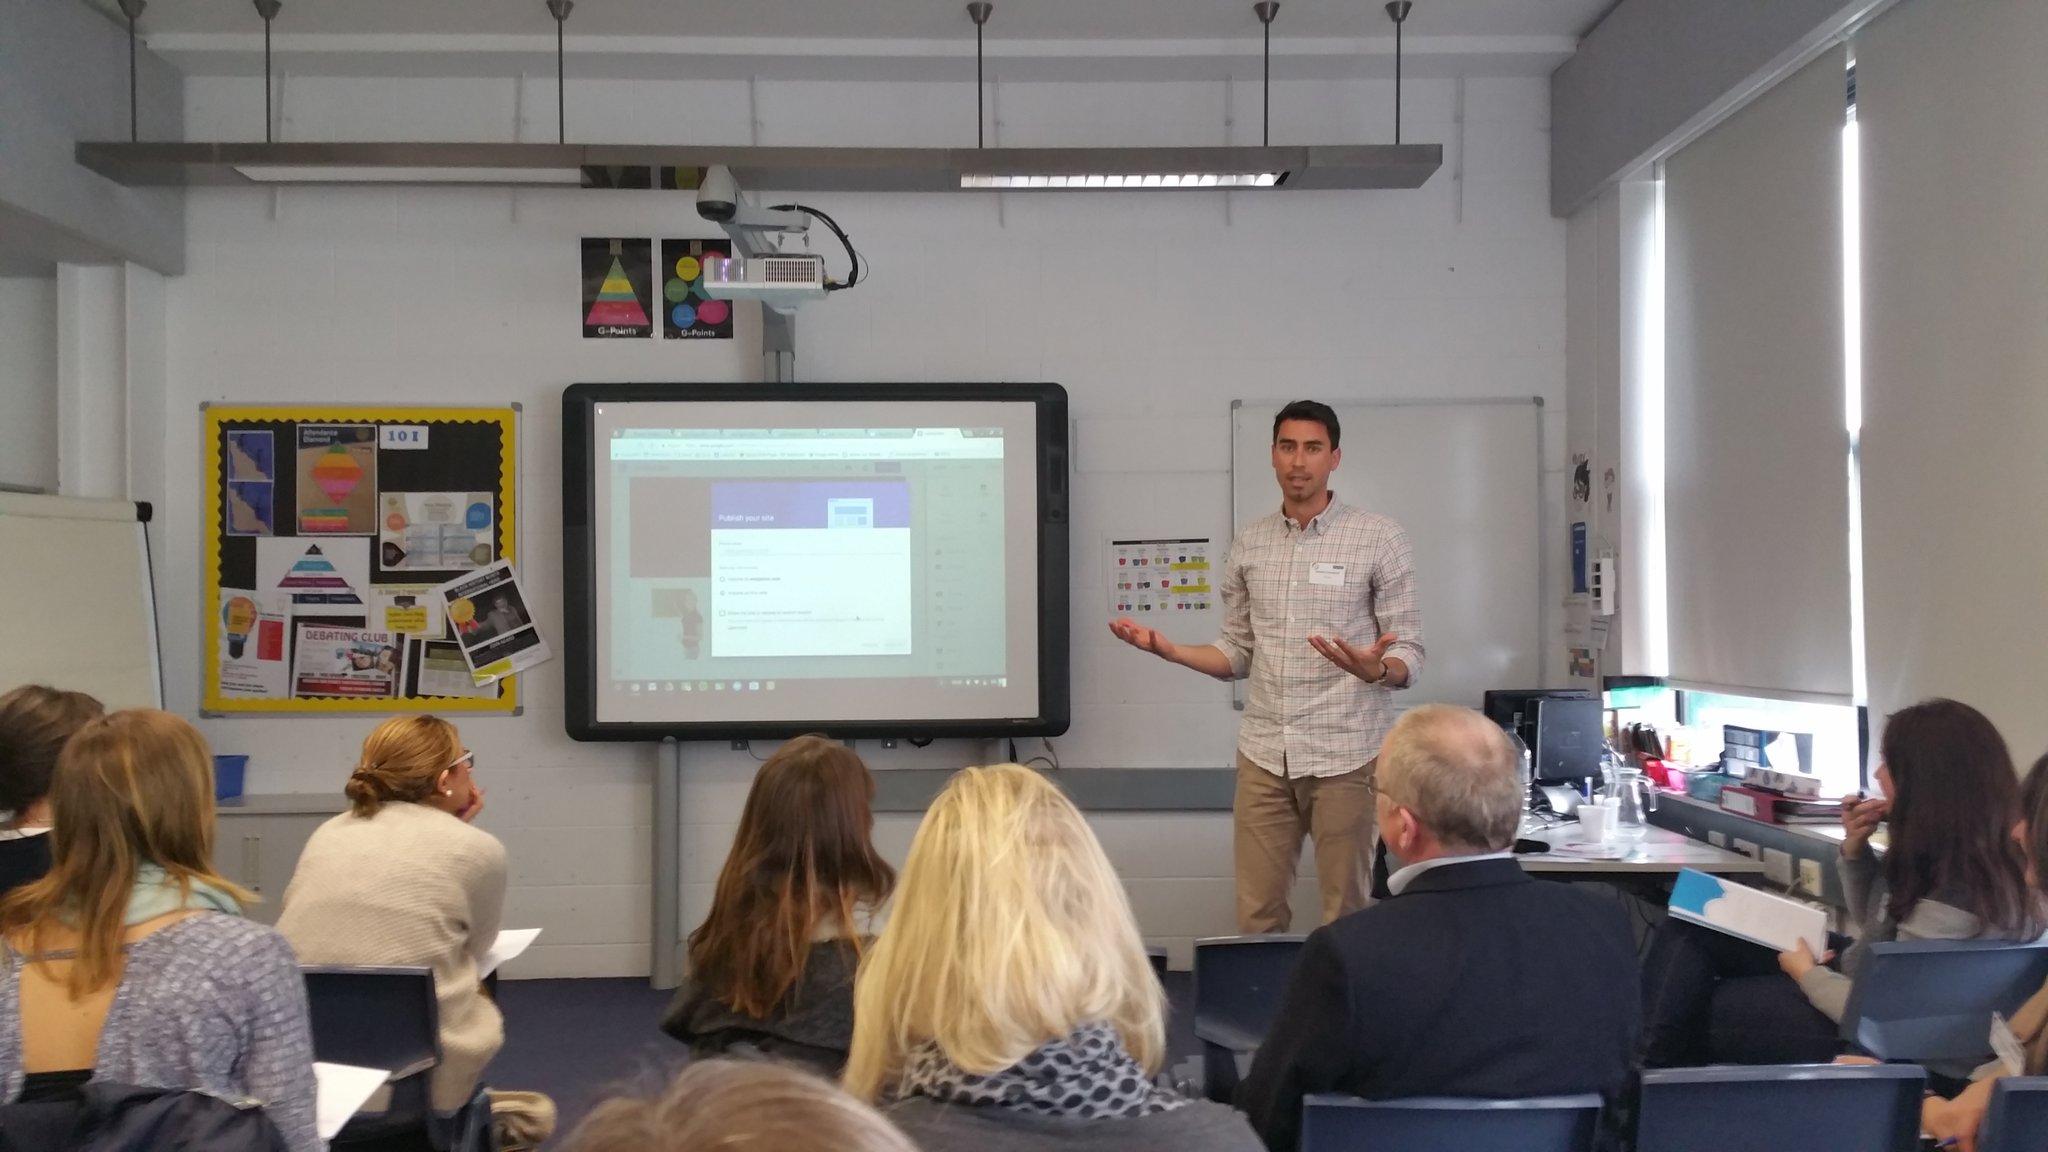 .@JamesLeonard1 of Google leads a.session on classroom technology #Teach2017 https://t.co/w1znt40jPi